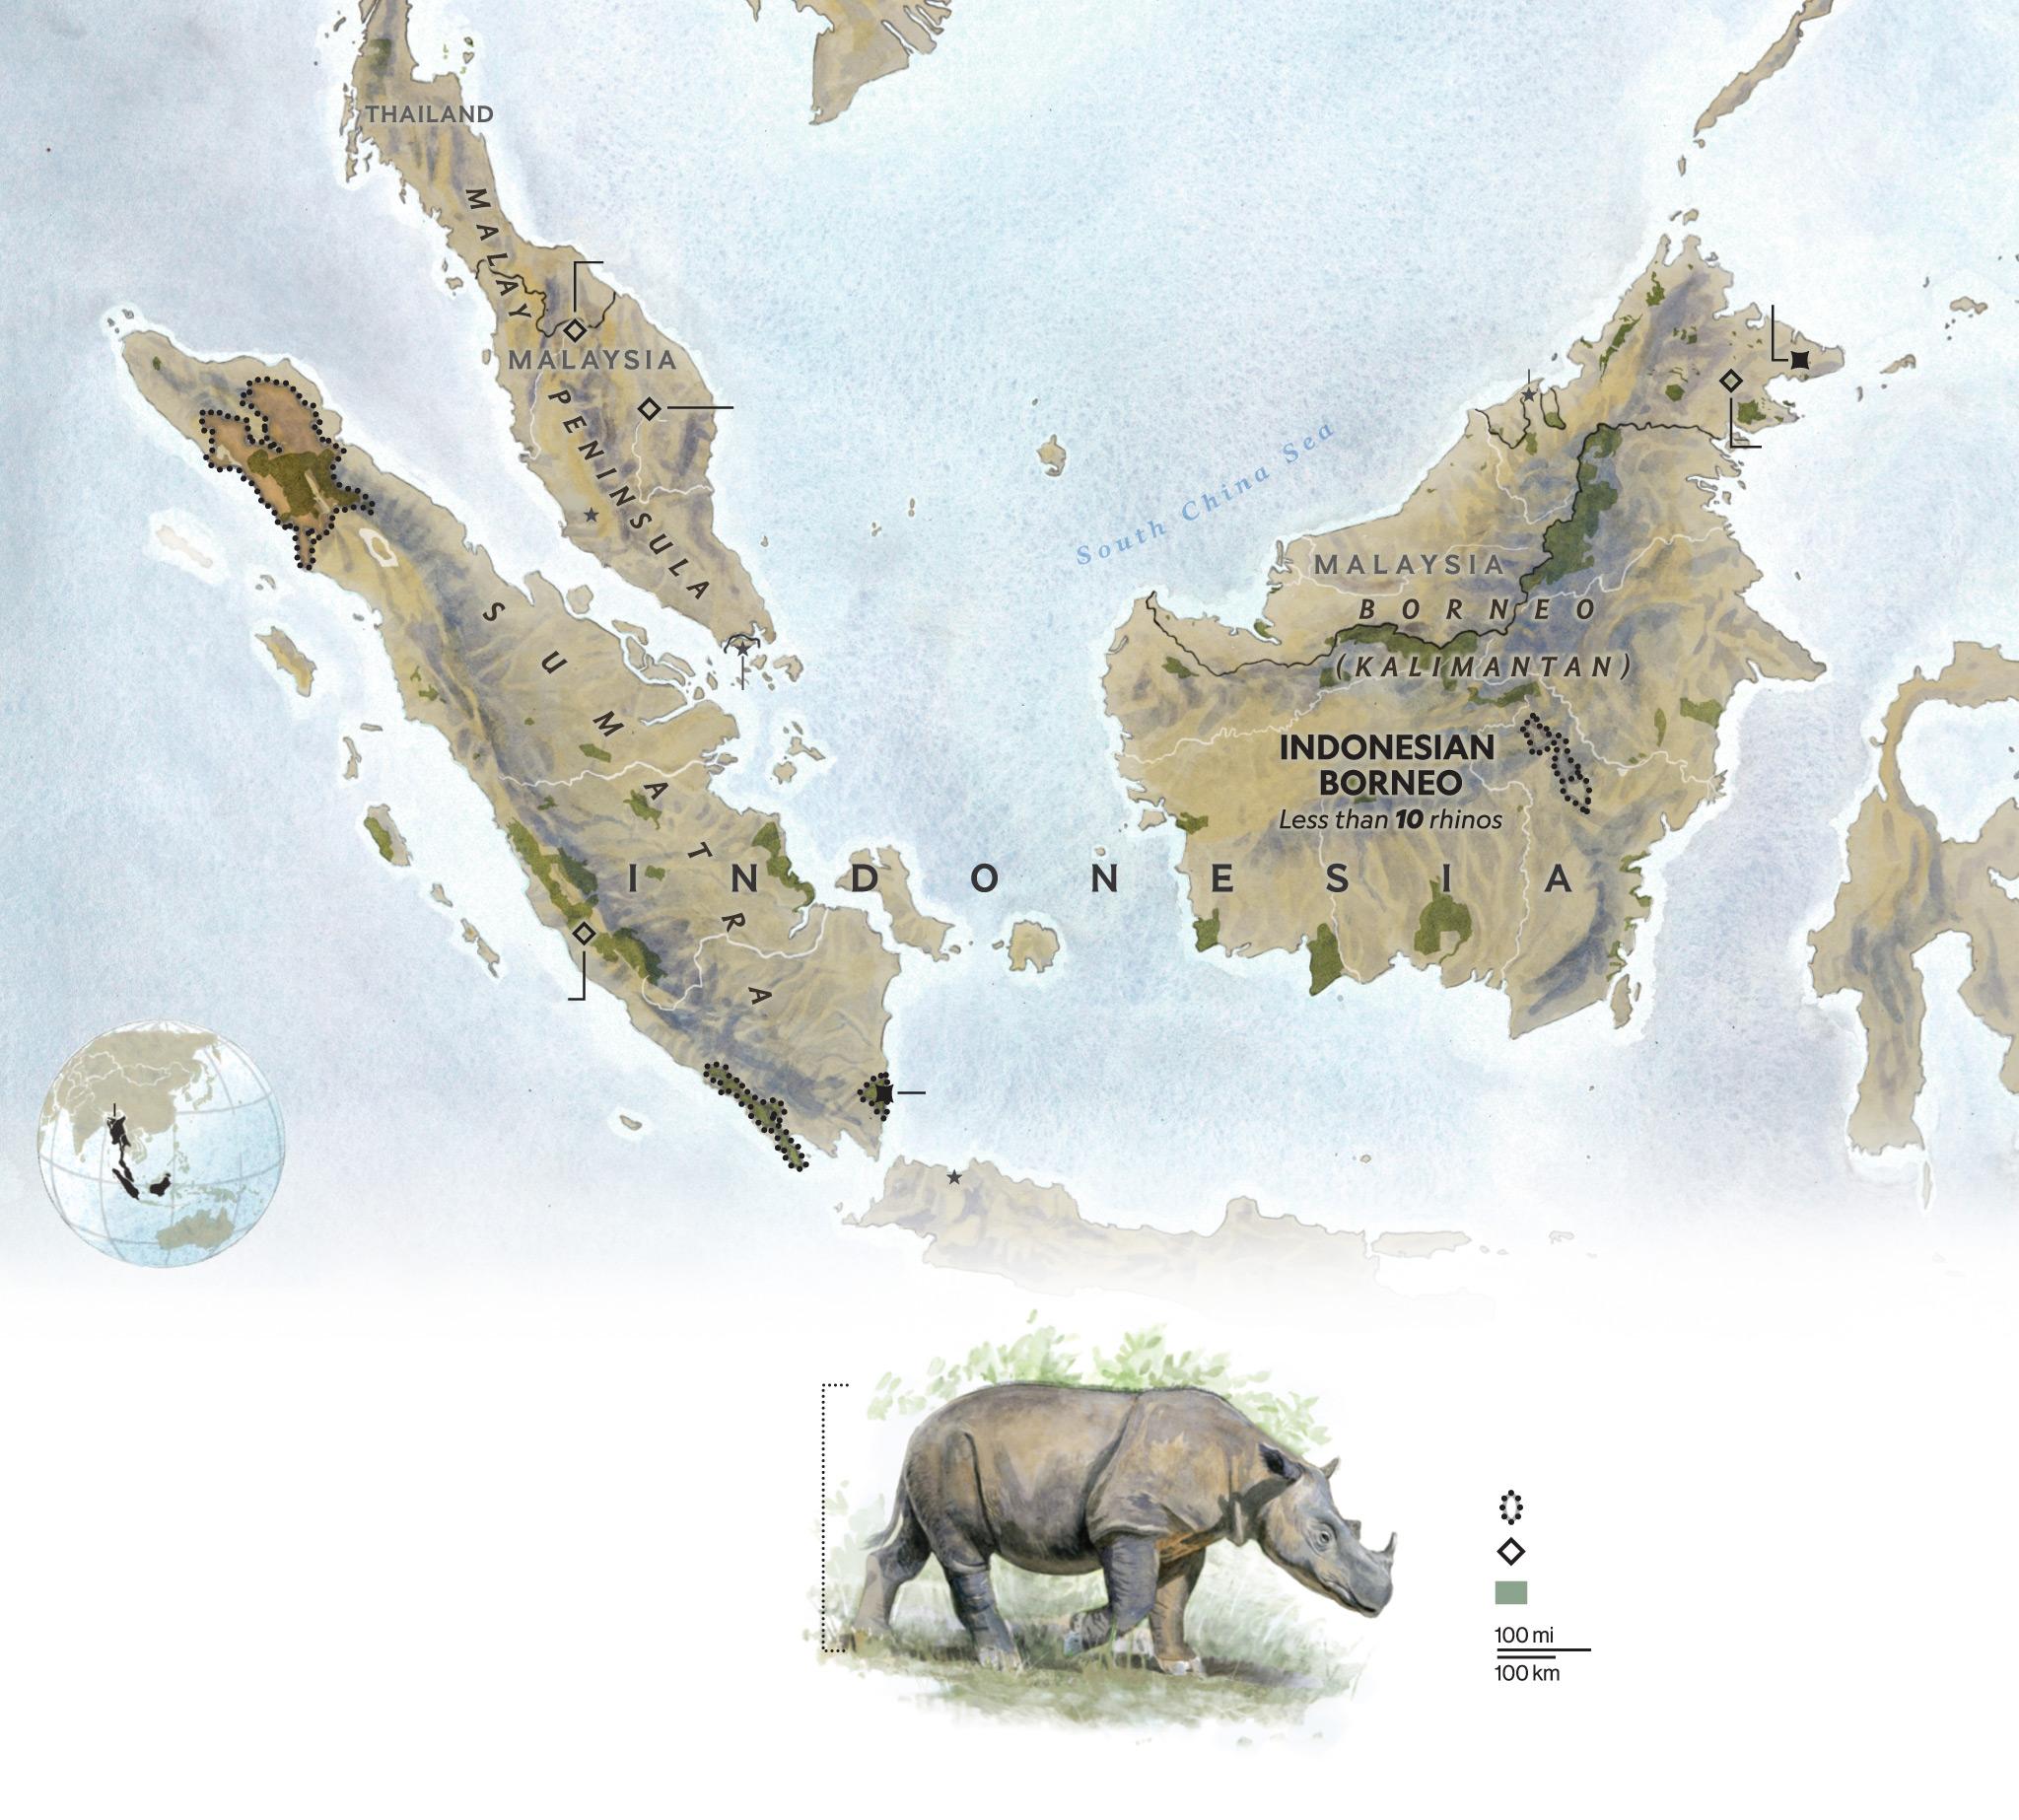 Extinction is looming for Sumatran Rhinos